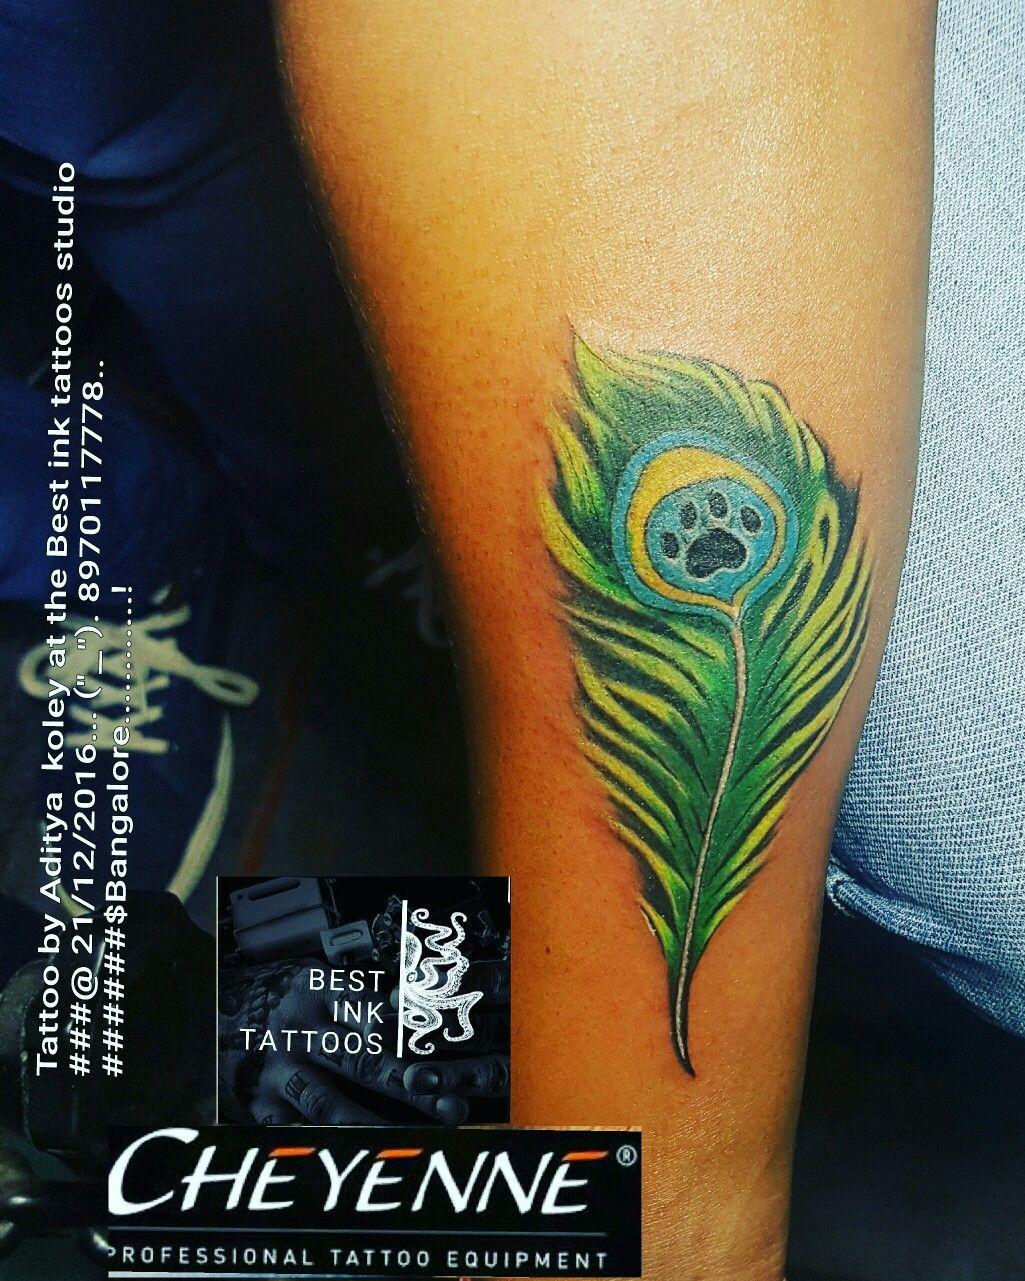 Bangalore Tattoos, Tattoo equipment, Print tattoos